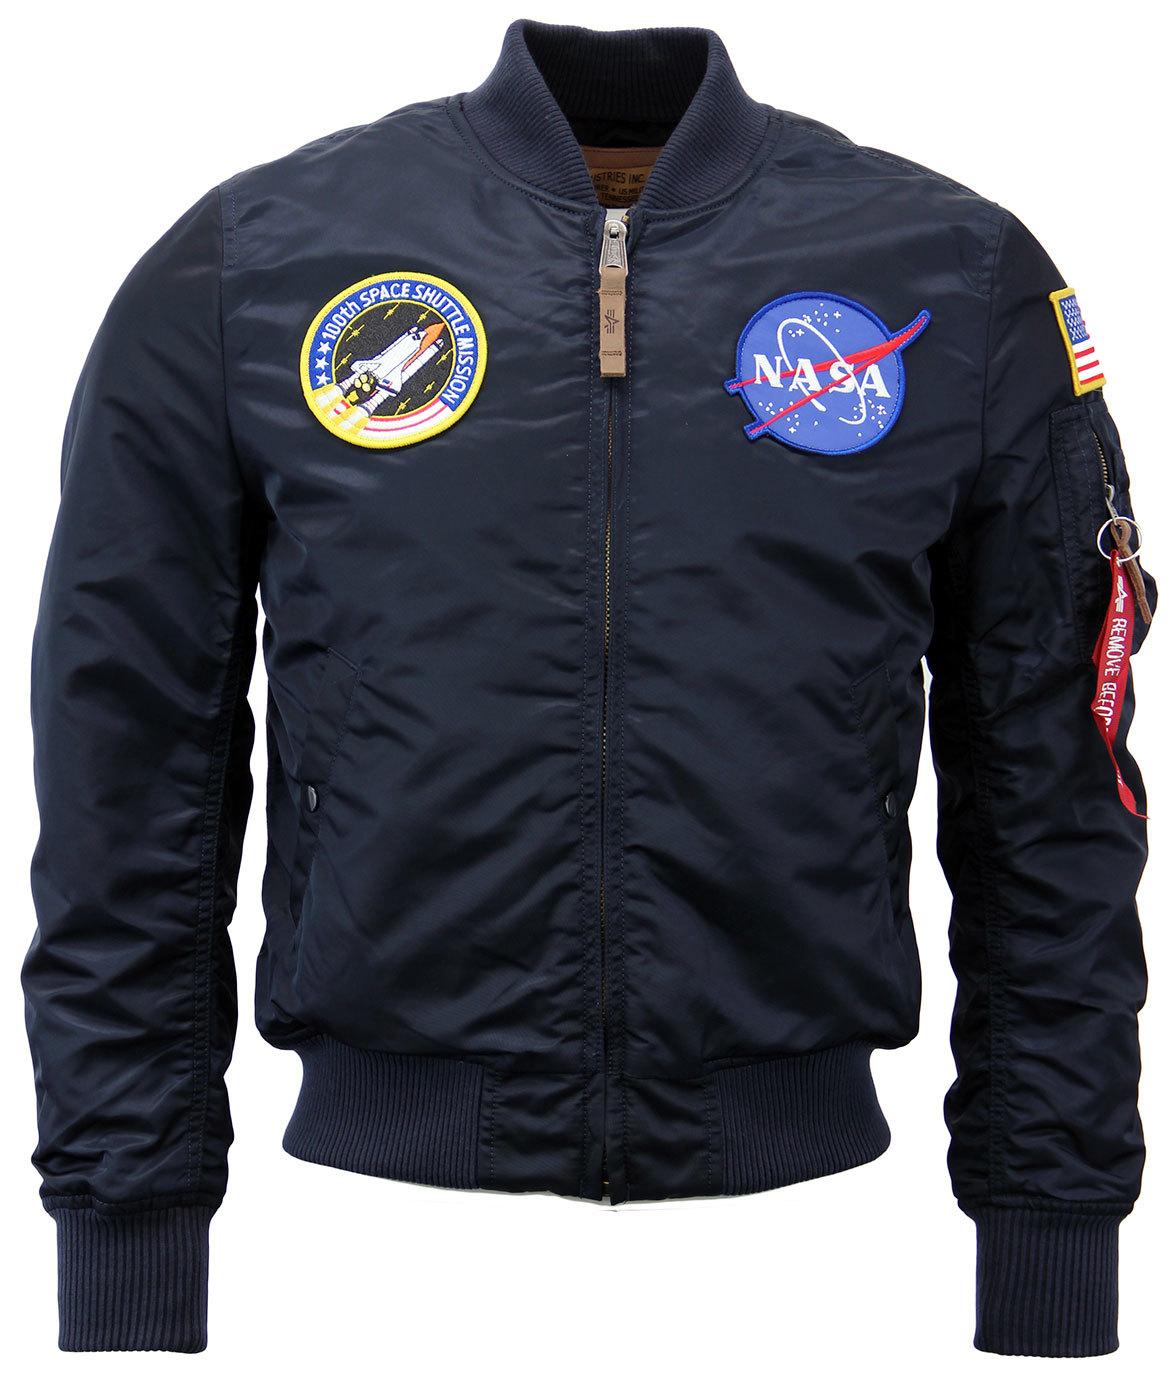 MA-1 VF NASA ALPHA INDSUTRIES Retro Flight Jacket